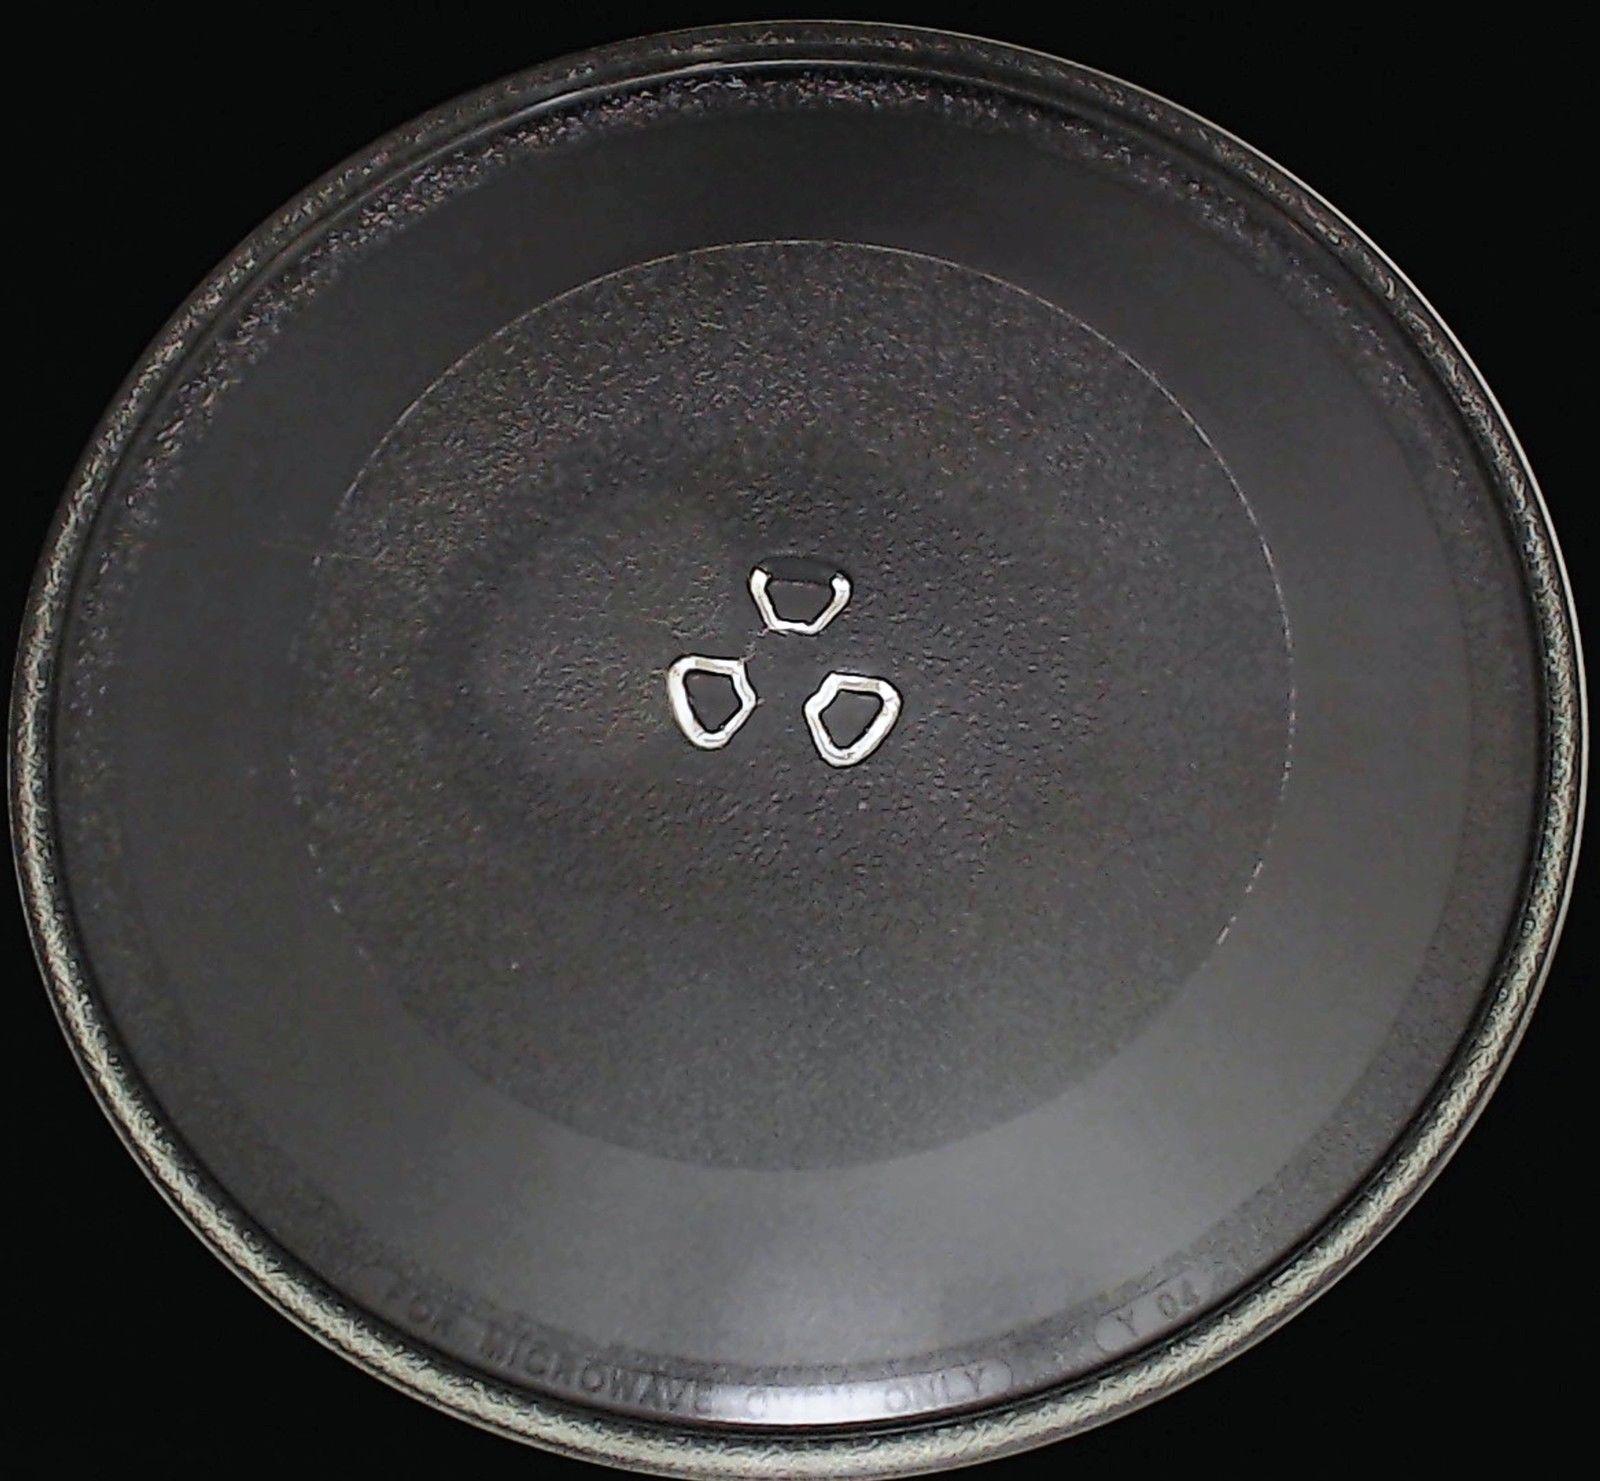 Genuine OEM Whirlpool 8172138 Microwave Glass Tray R9800455,53001023,8184853